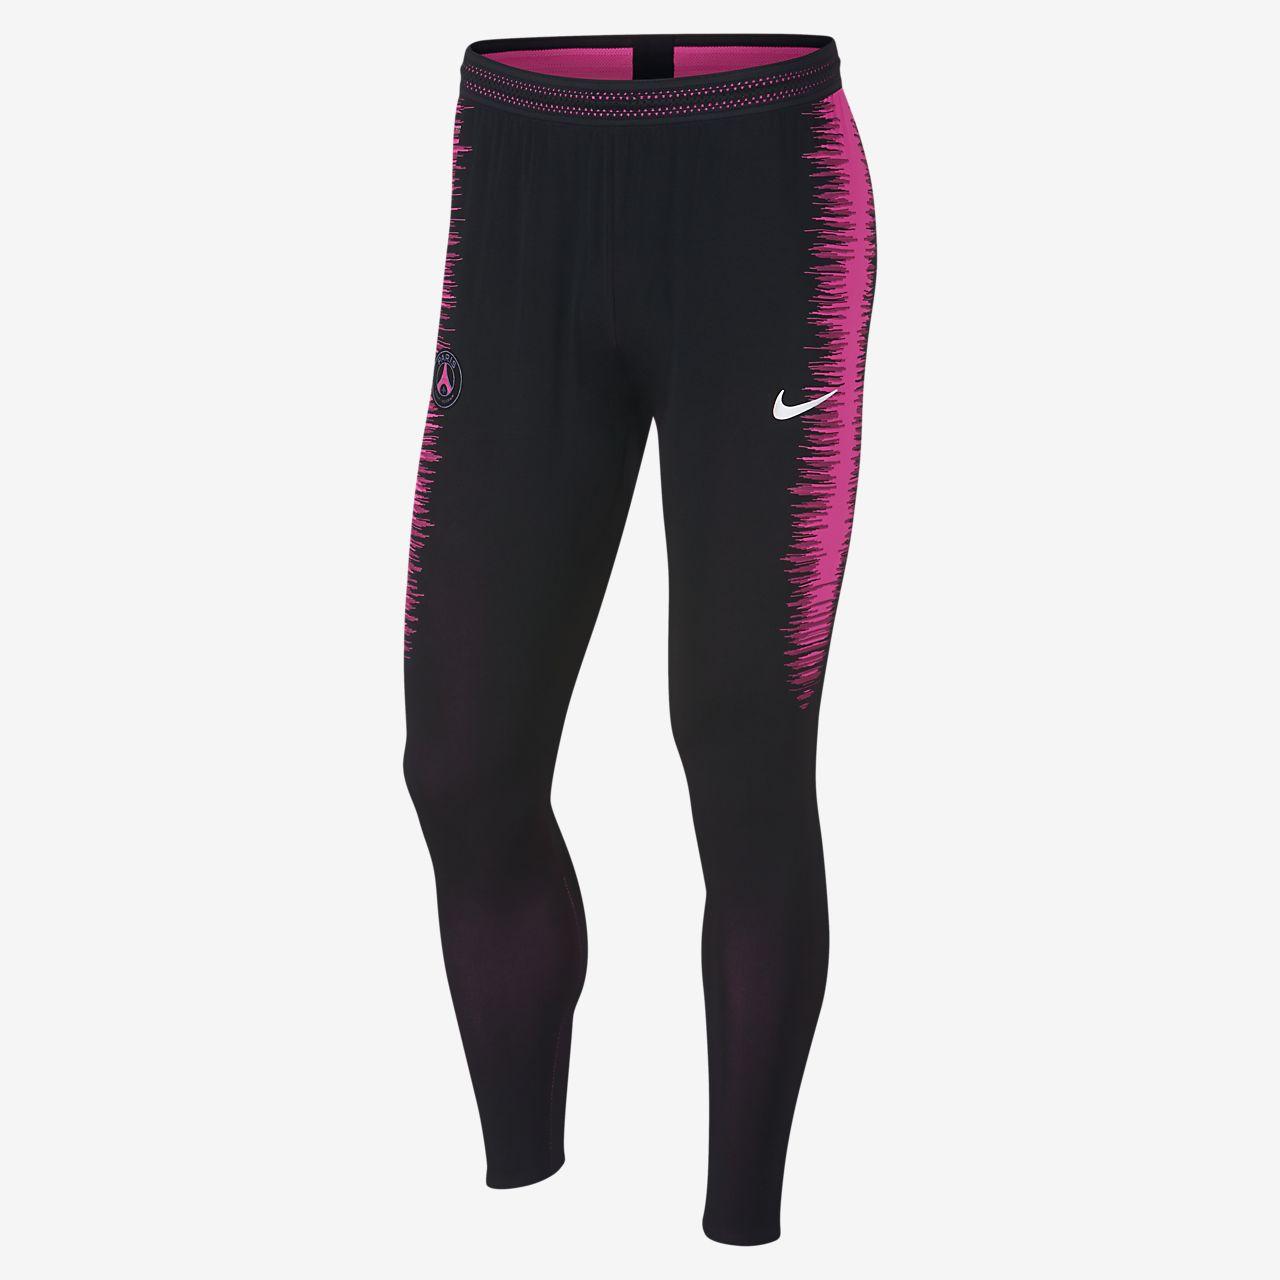 74a4f2281eee Paris Saint-Germain VaporKnit Strike Men s Football Pants. Nike.com GB